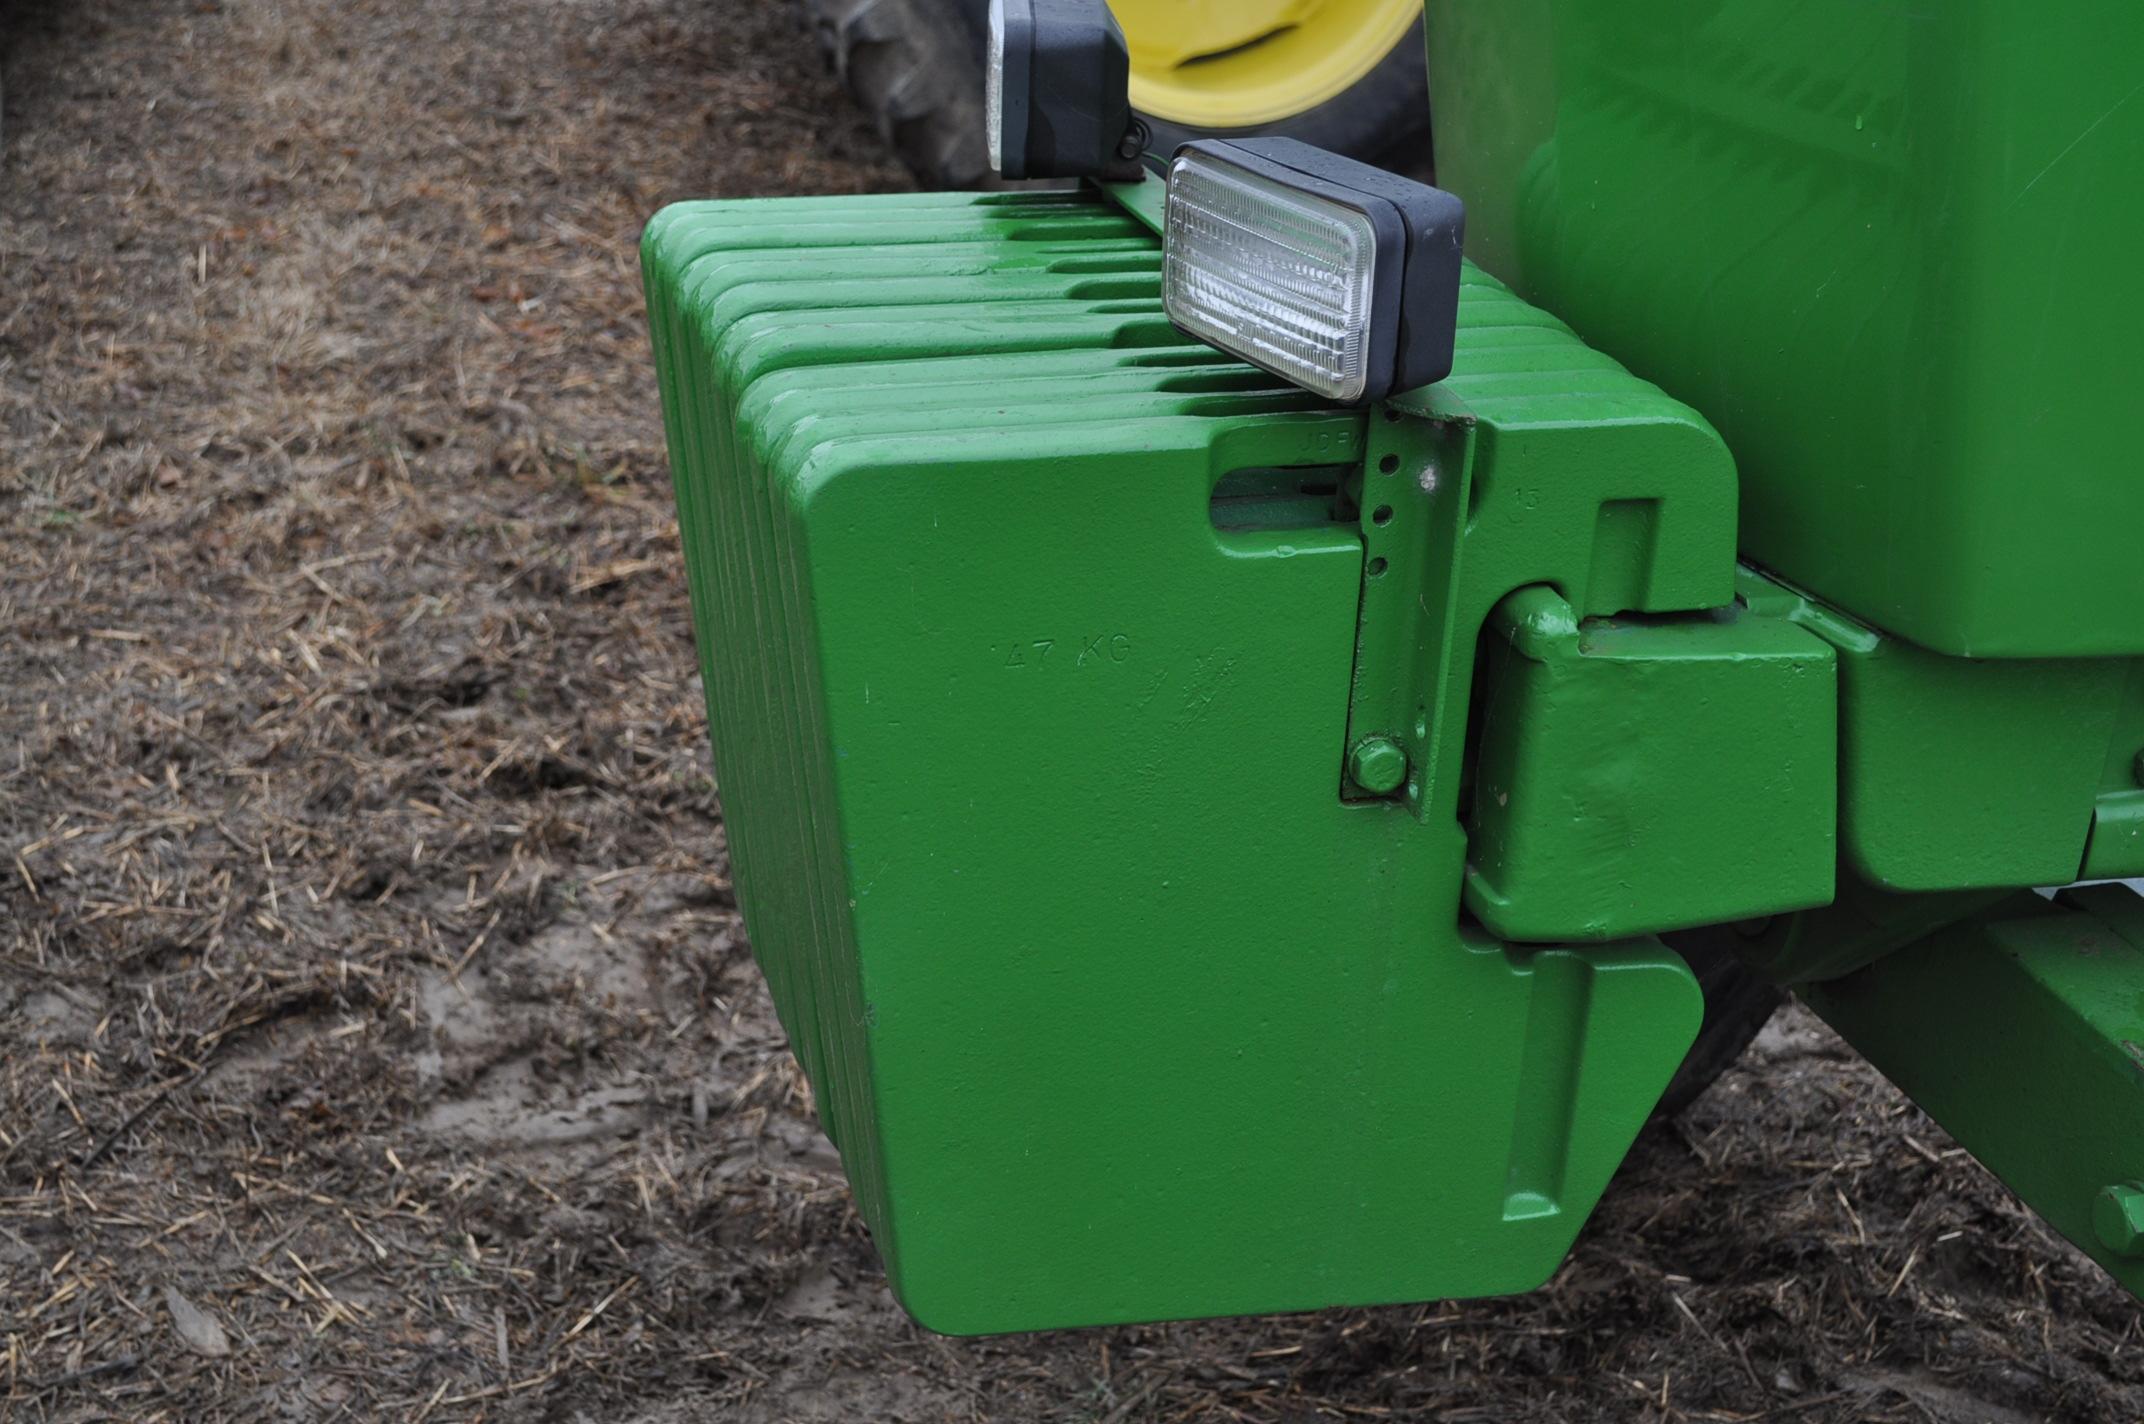 John Deere 4630 tractor, diesel, 20.8-38 hub duals, 14L-16 front, CHA, Quad range, 2 hyd remotes, - Image 15 of 22